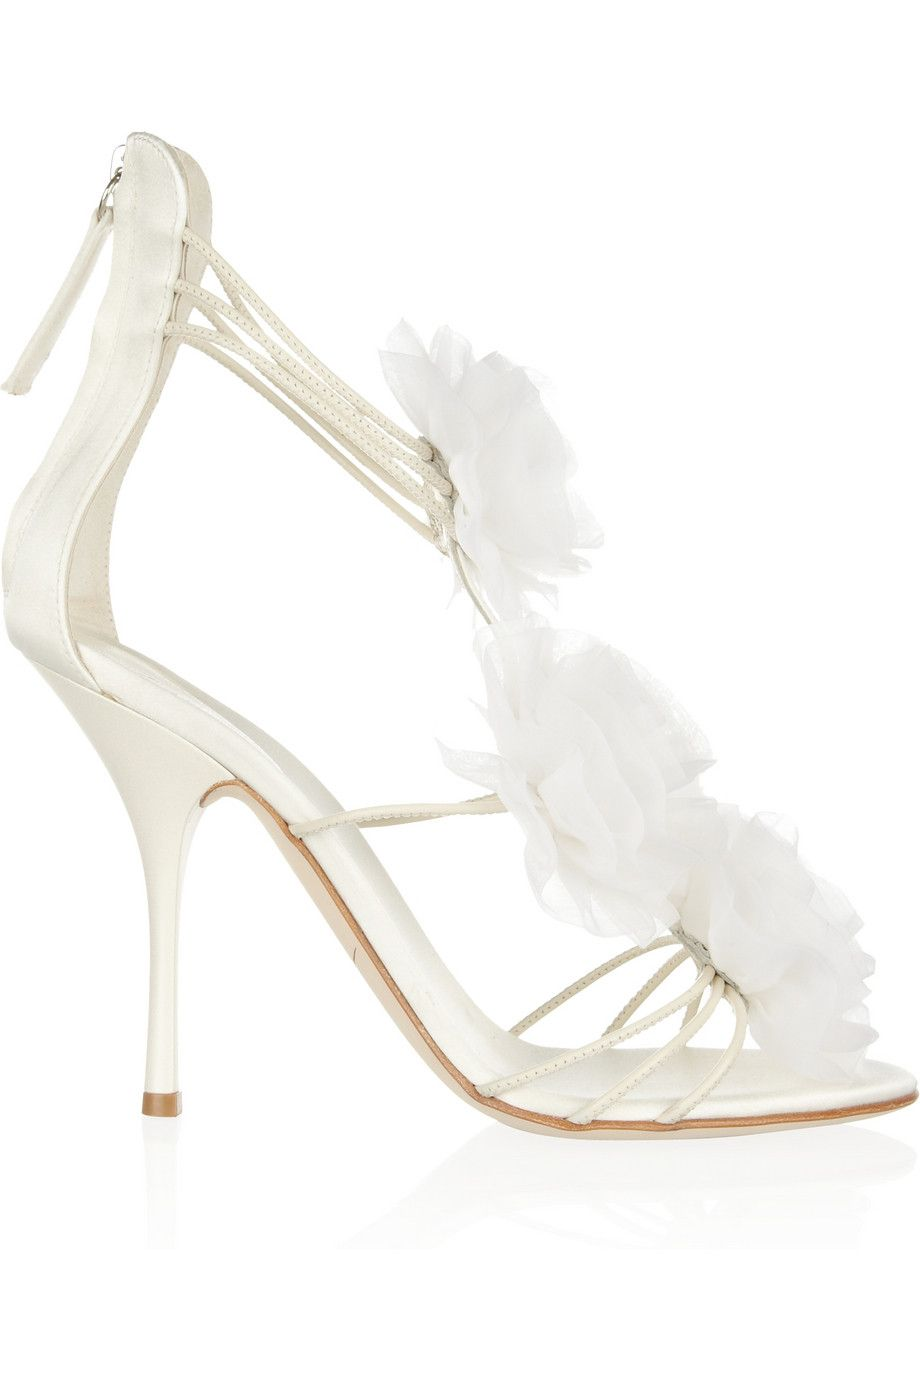 Explore Giuseppe Zanotti Design, Hot Shoes, And More!